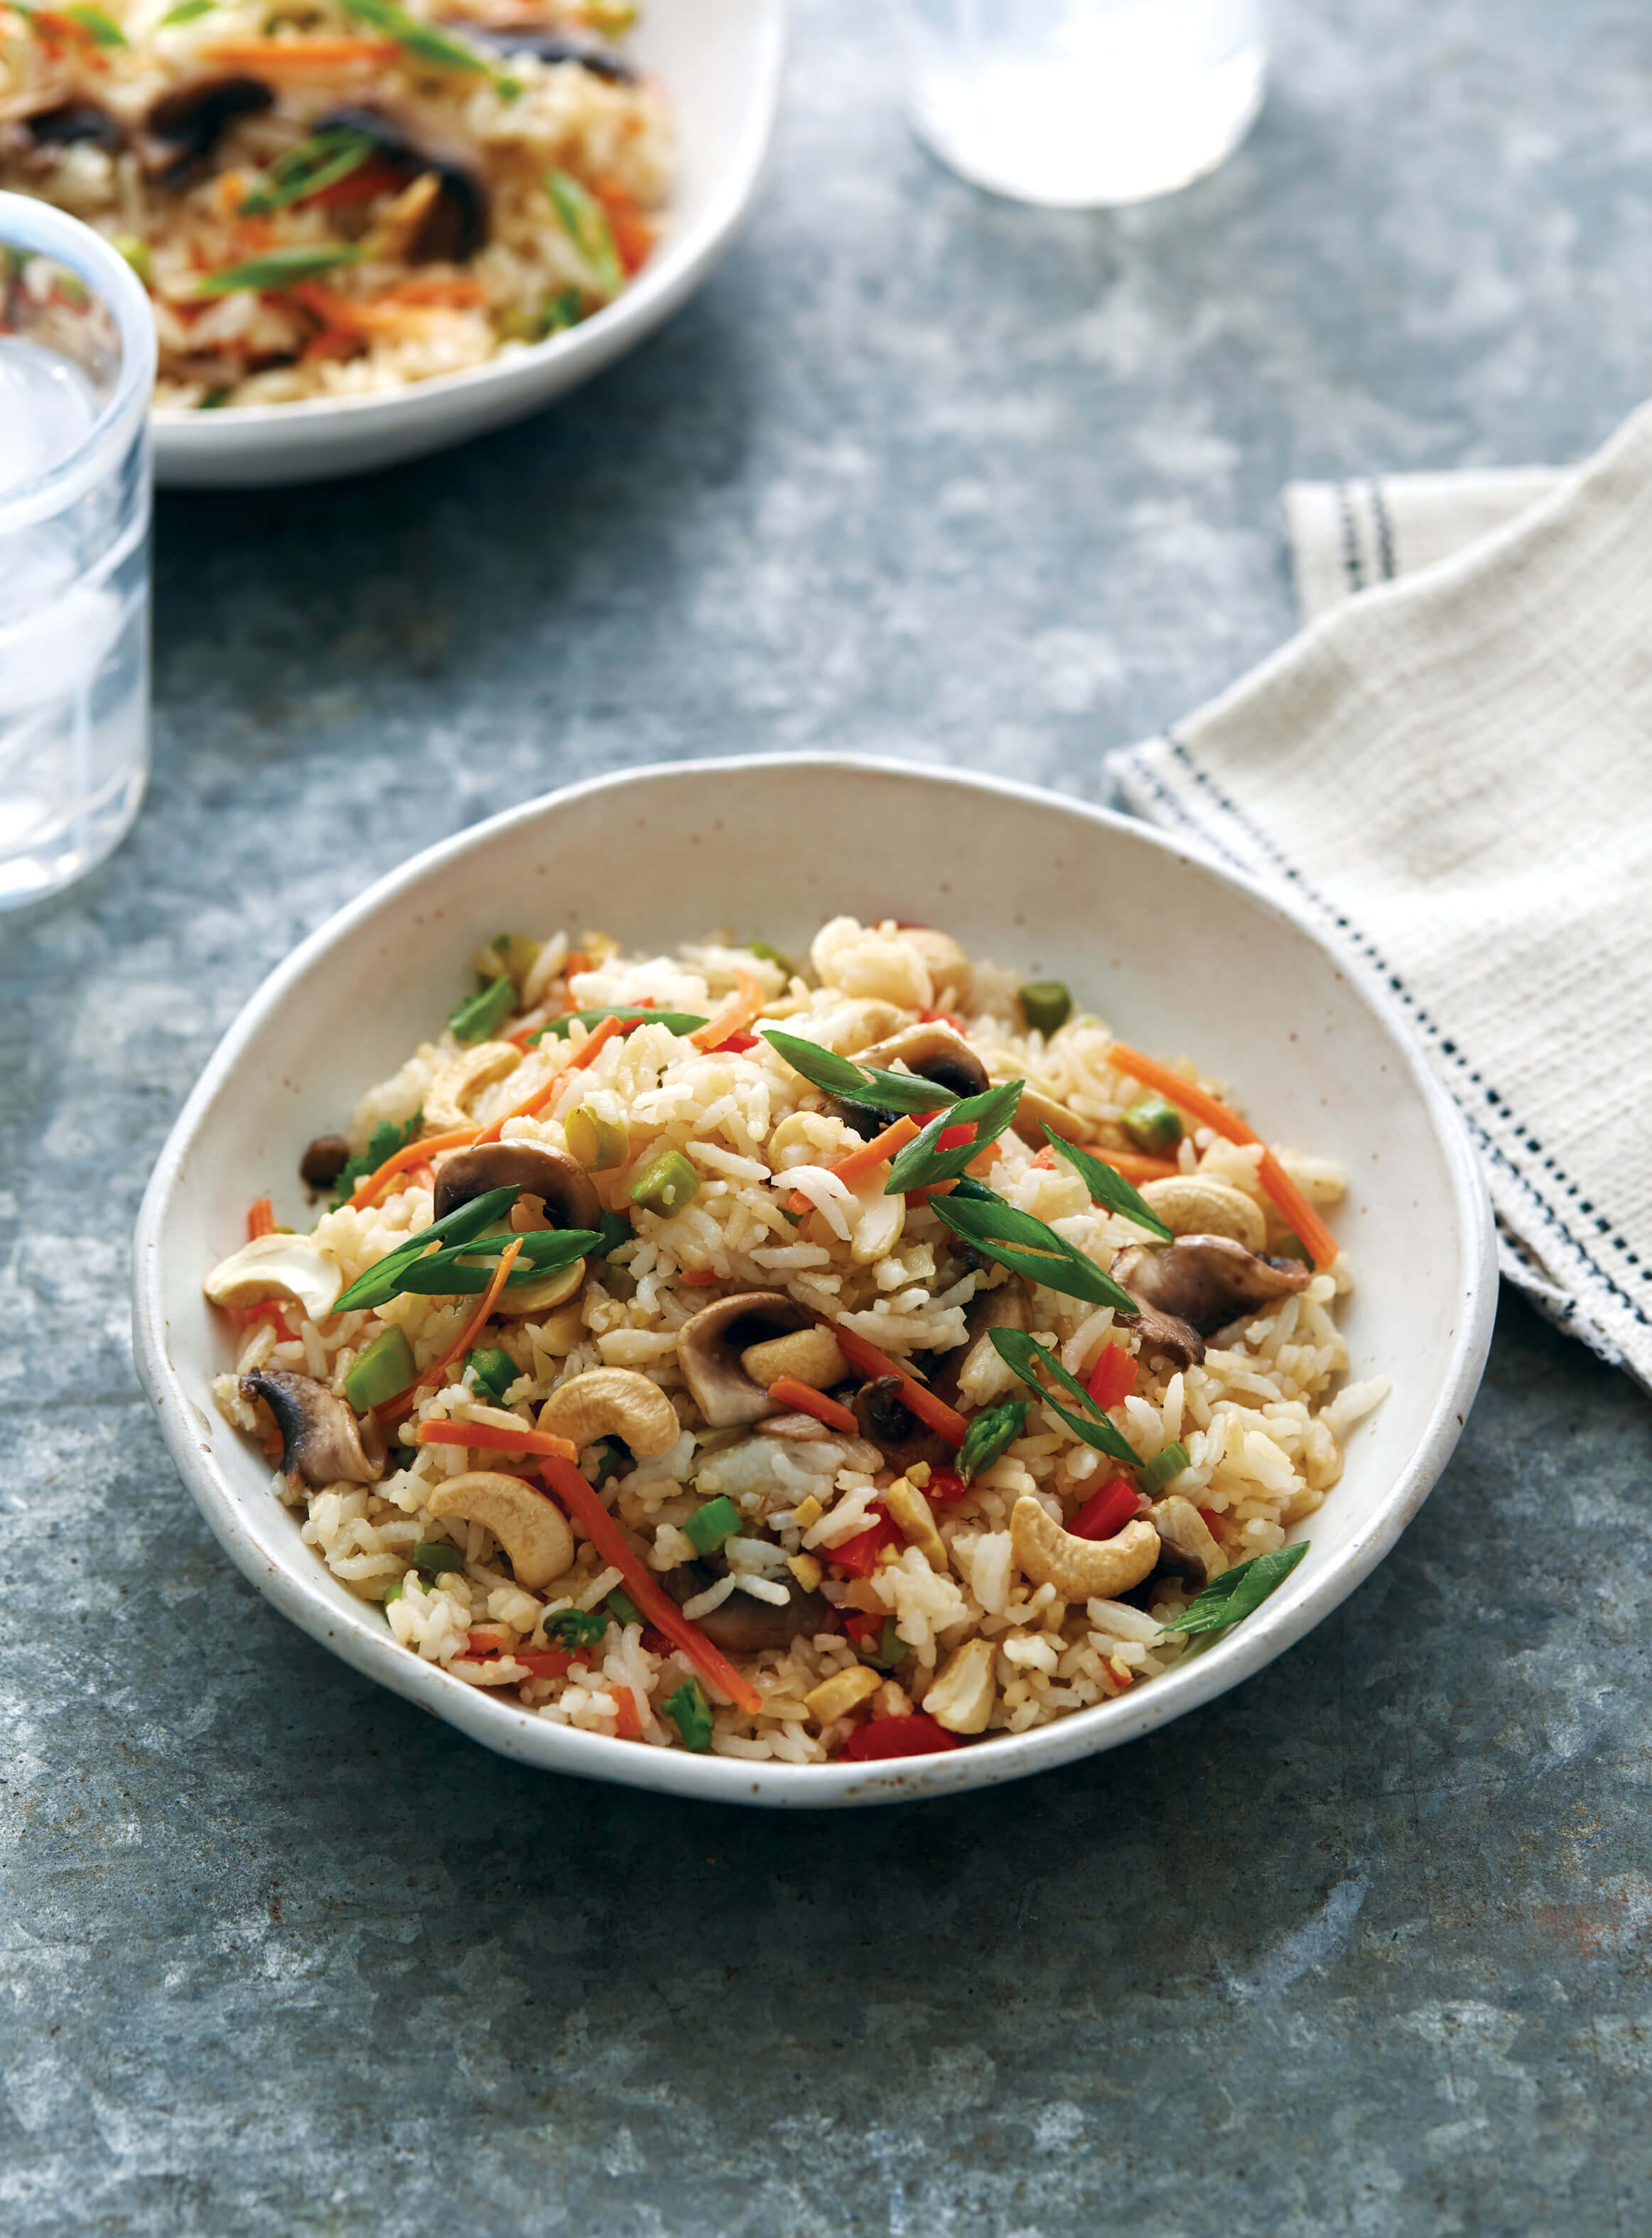 Cashew Mushroom Fried Rice | Seriously Good Freezer Meals